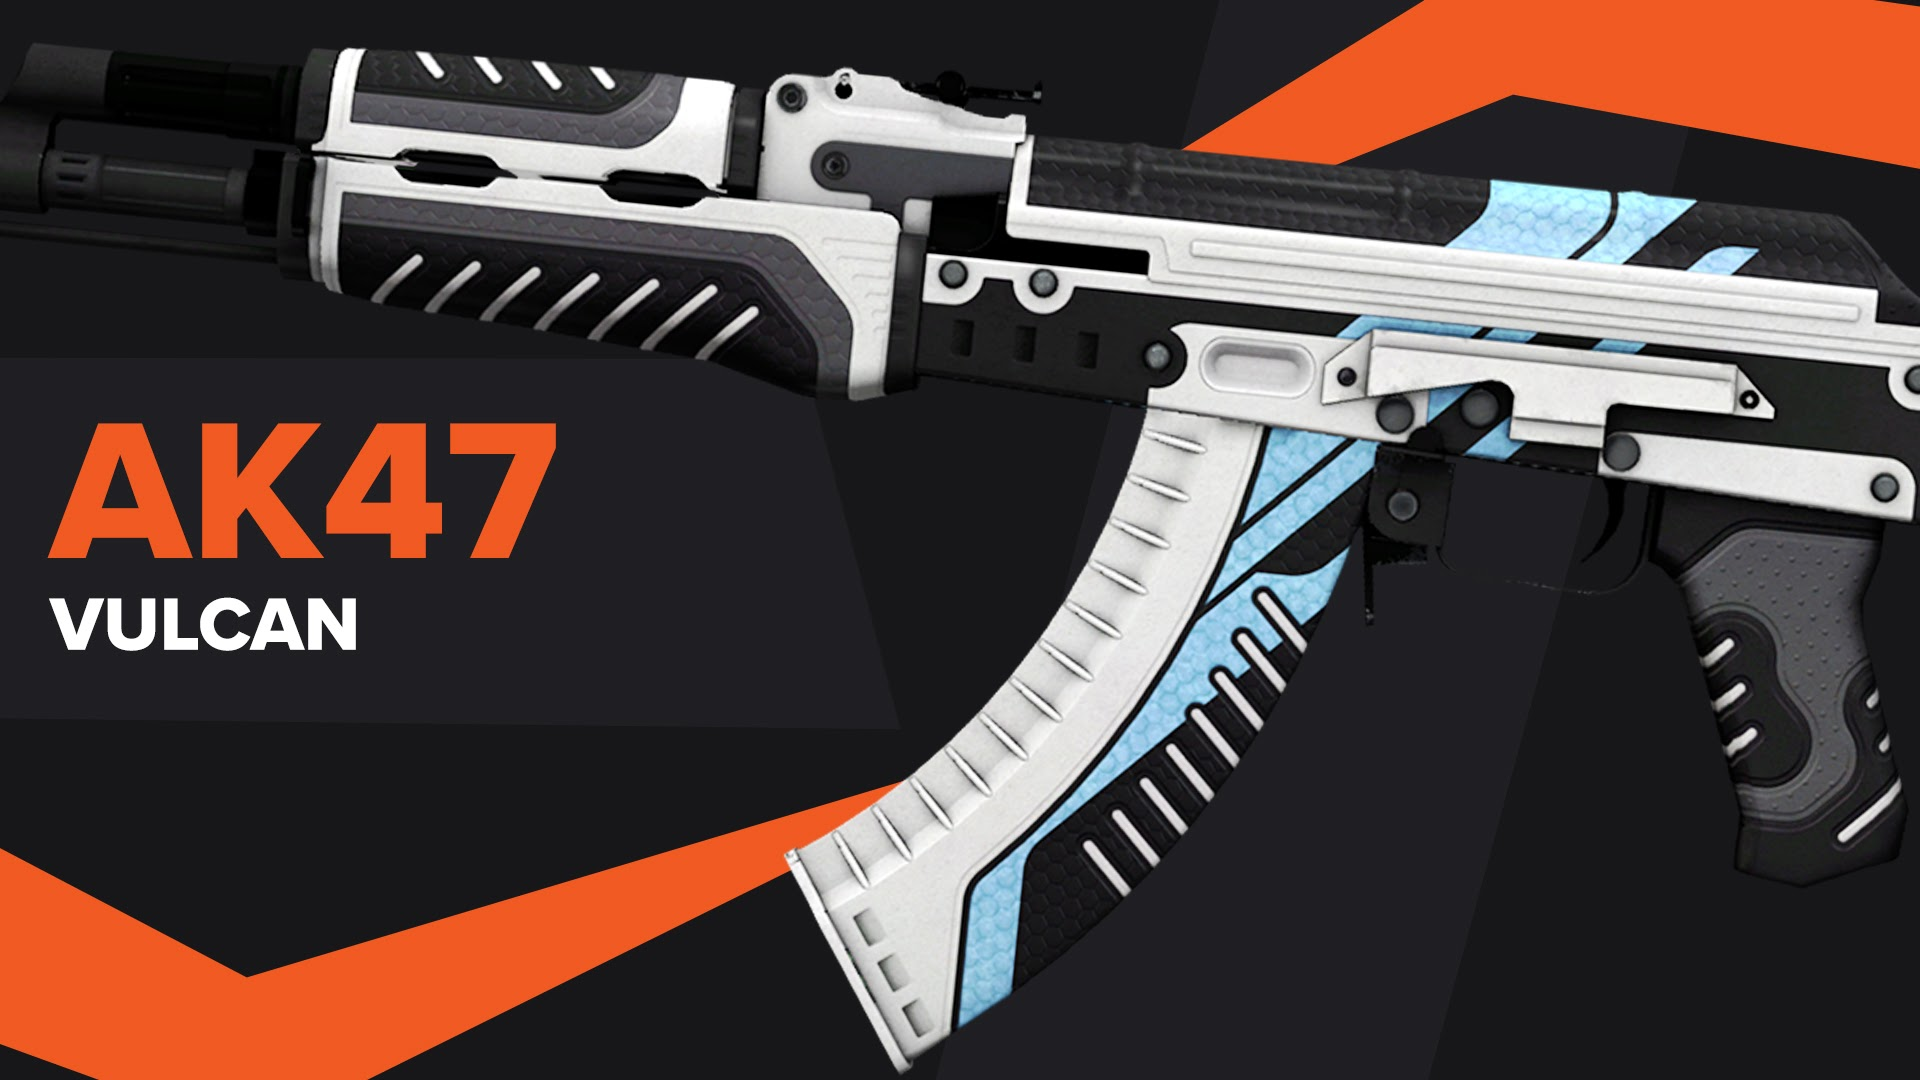 AK47 Vulcan CSGO Skin